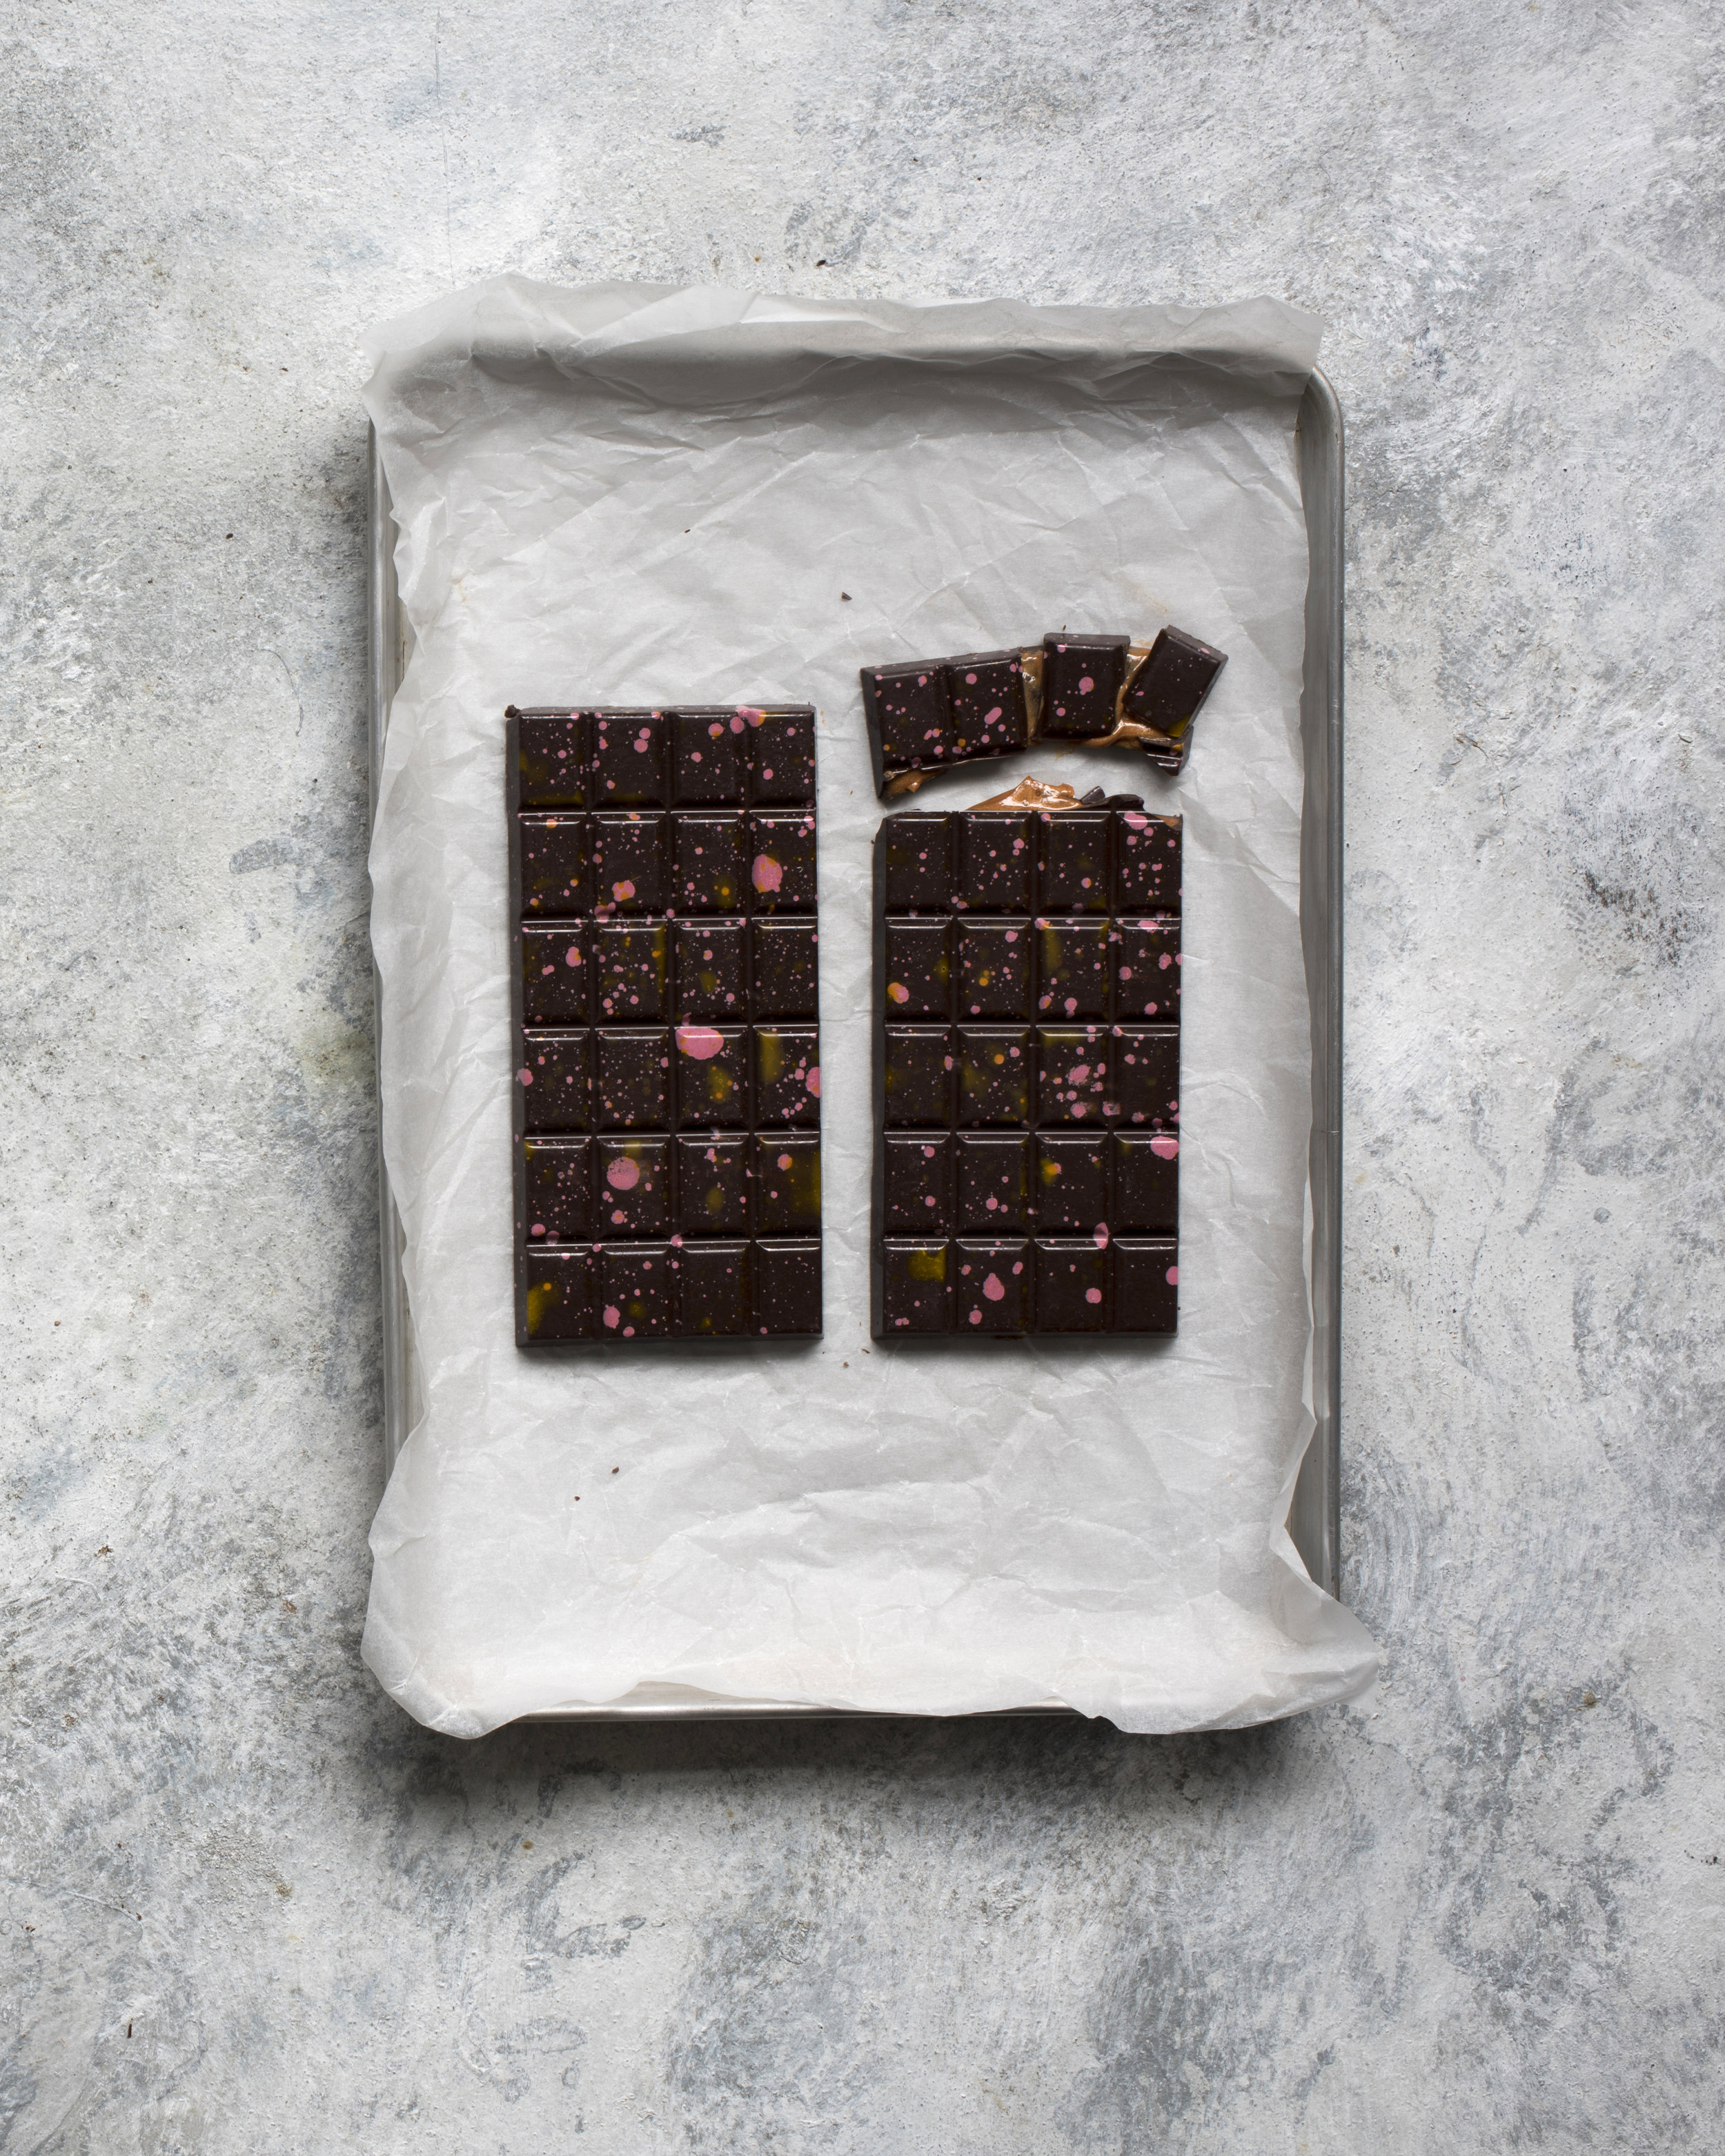 Chocolate Bar Broken on Tray.jpg